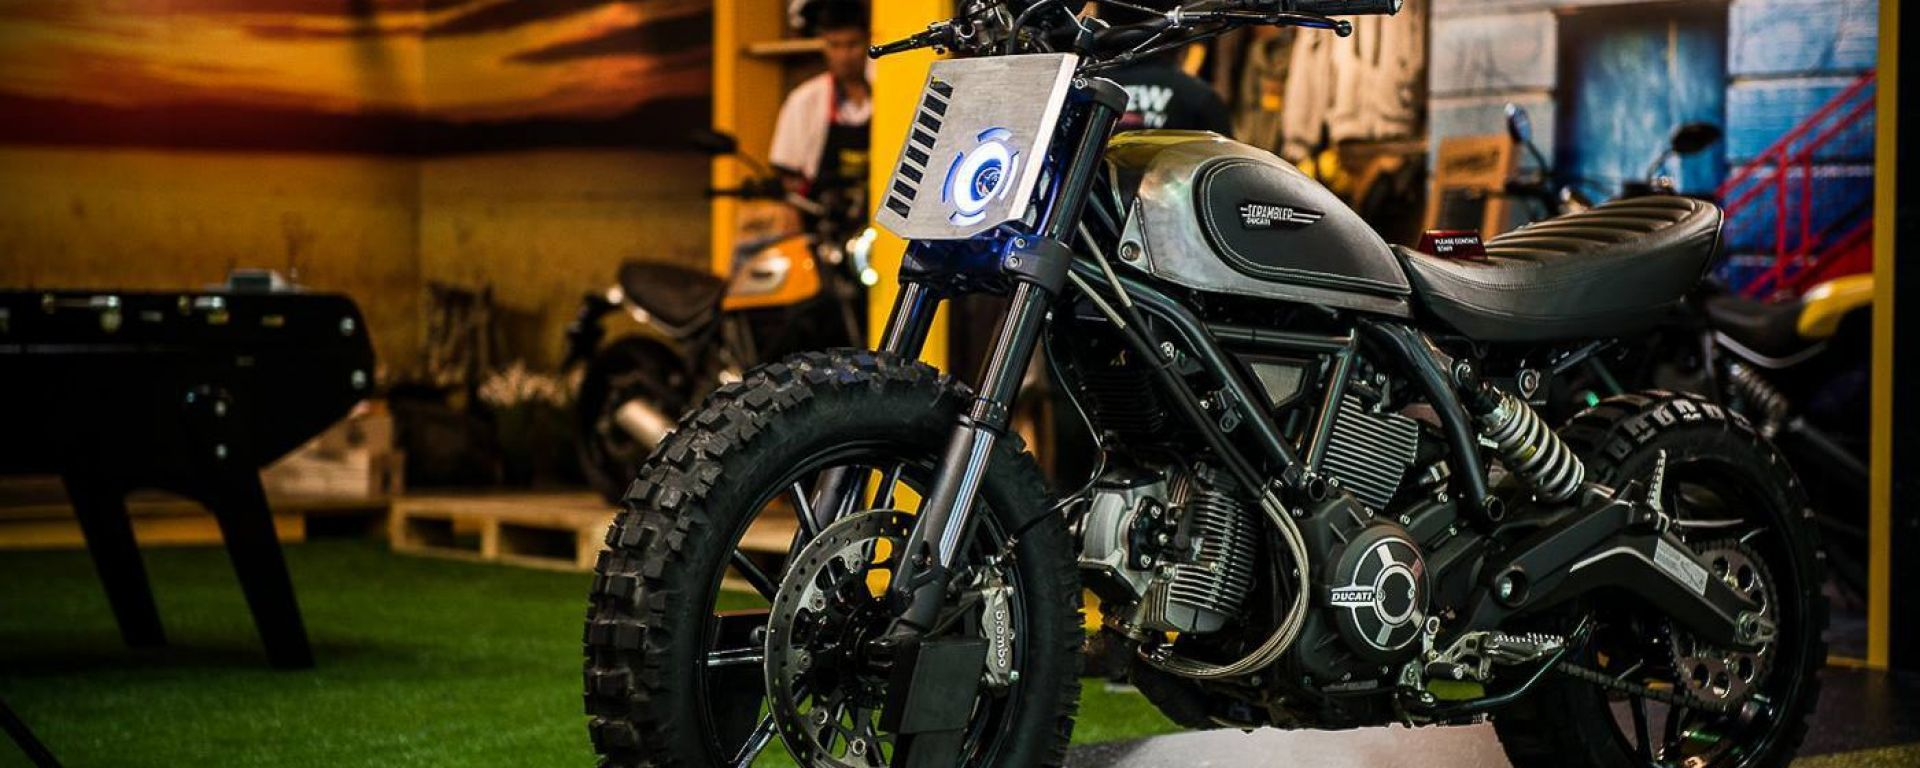 Scrambler Ducati Dirt Track Concept